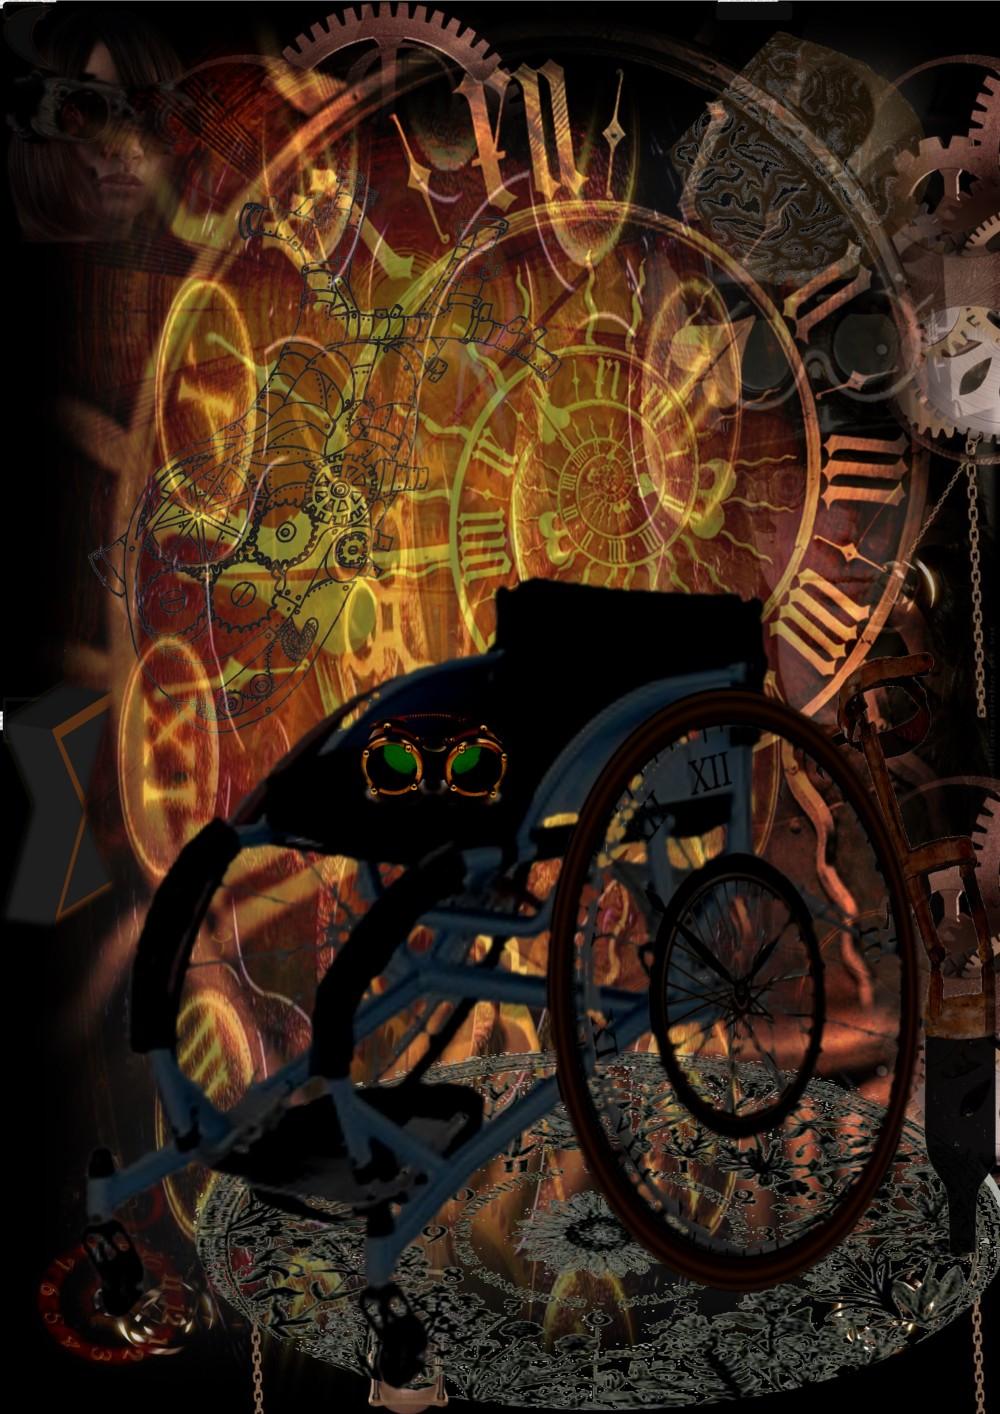 Wheels of Time by Antonia Sara Zenkevitch